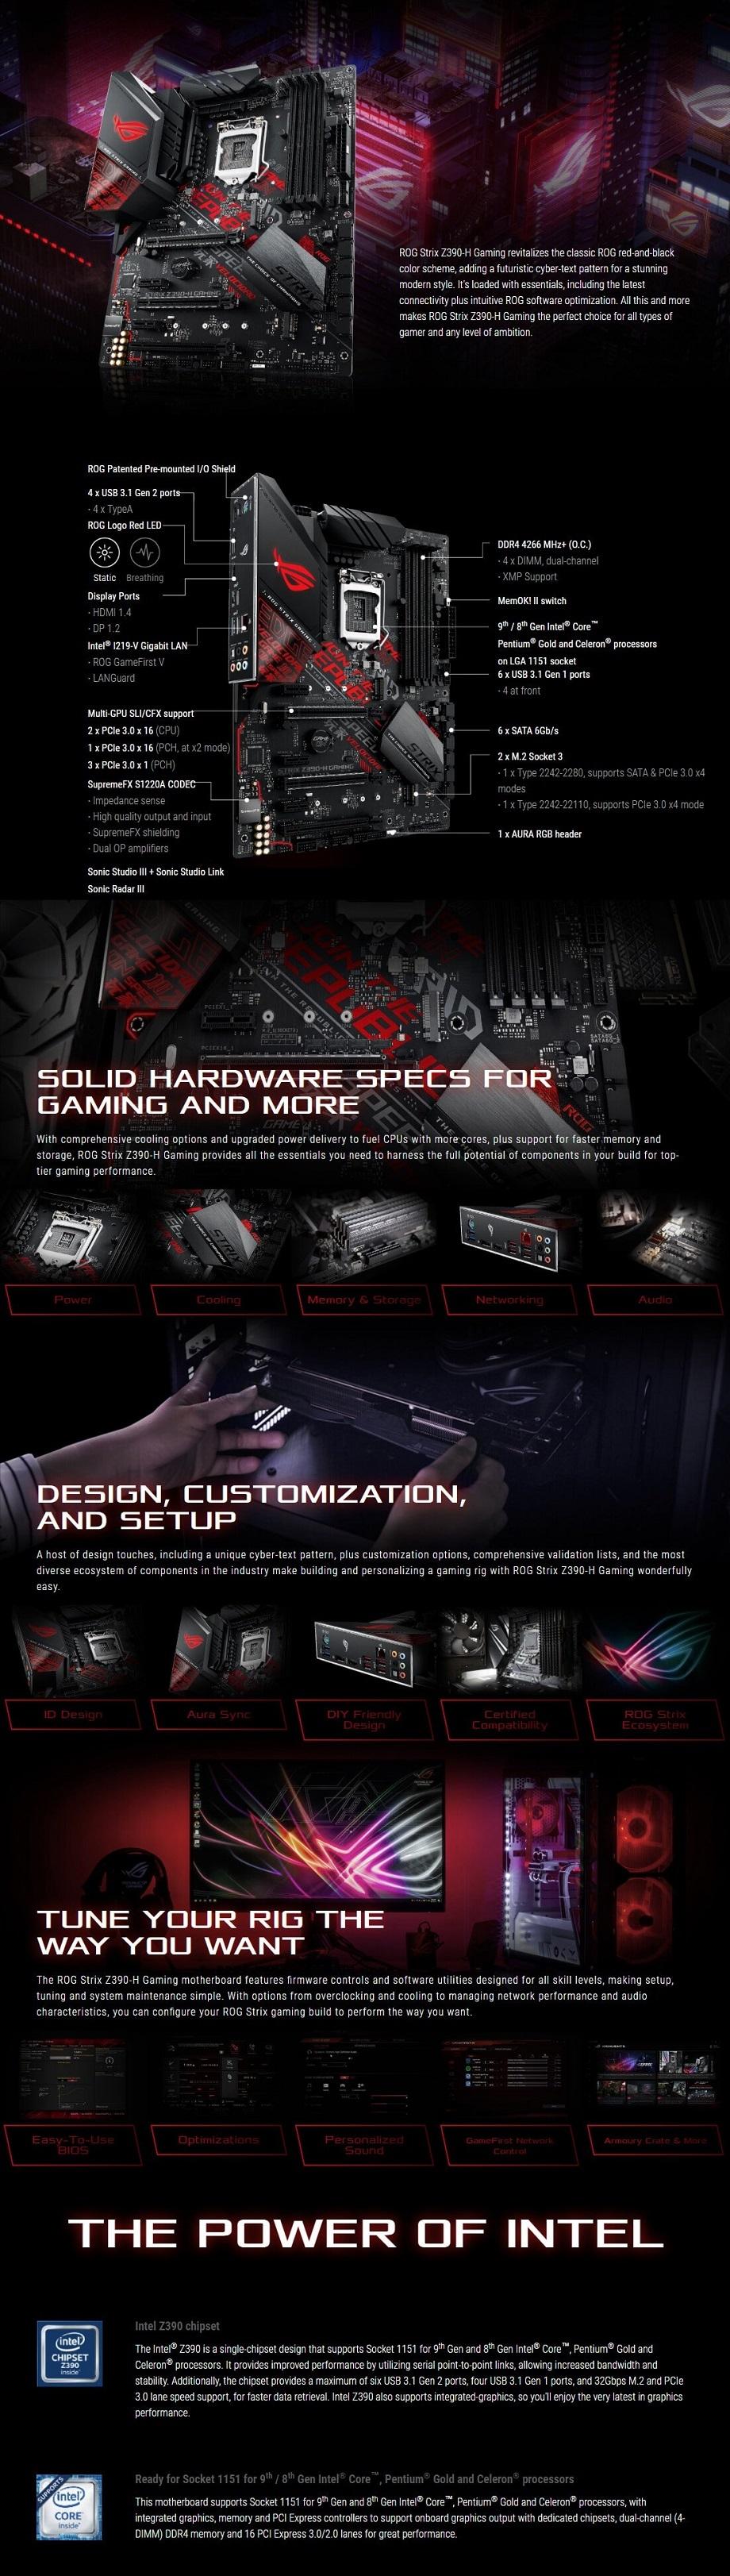 ASUS ROG Strix Z390-H Intel 8th/9th Gen Gaming Motherboard